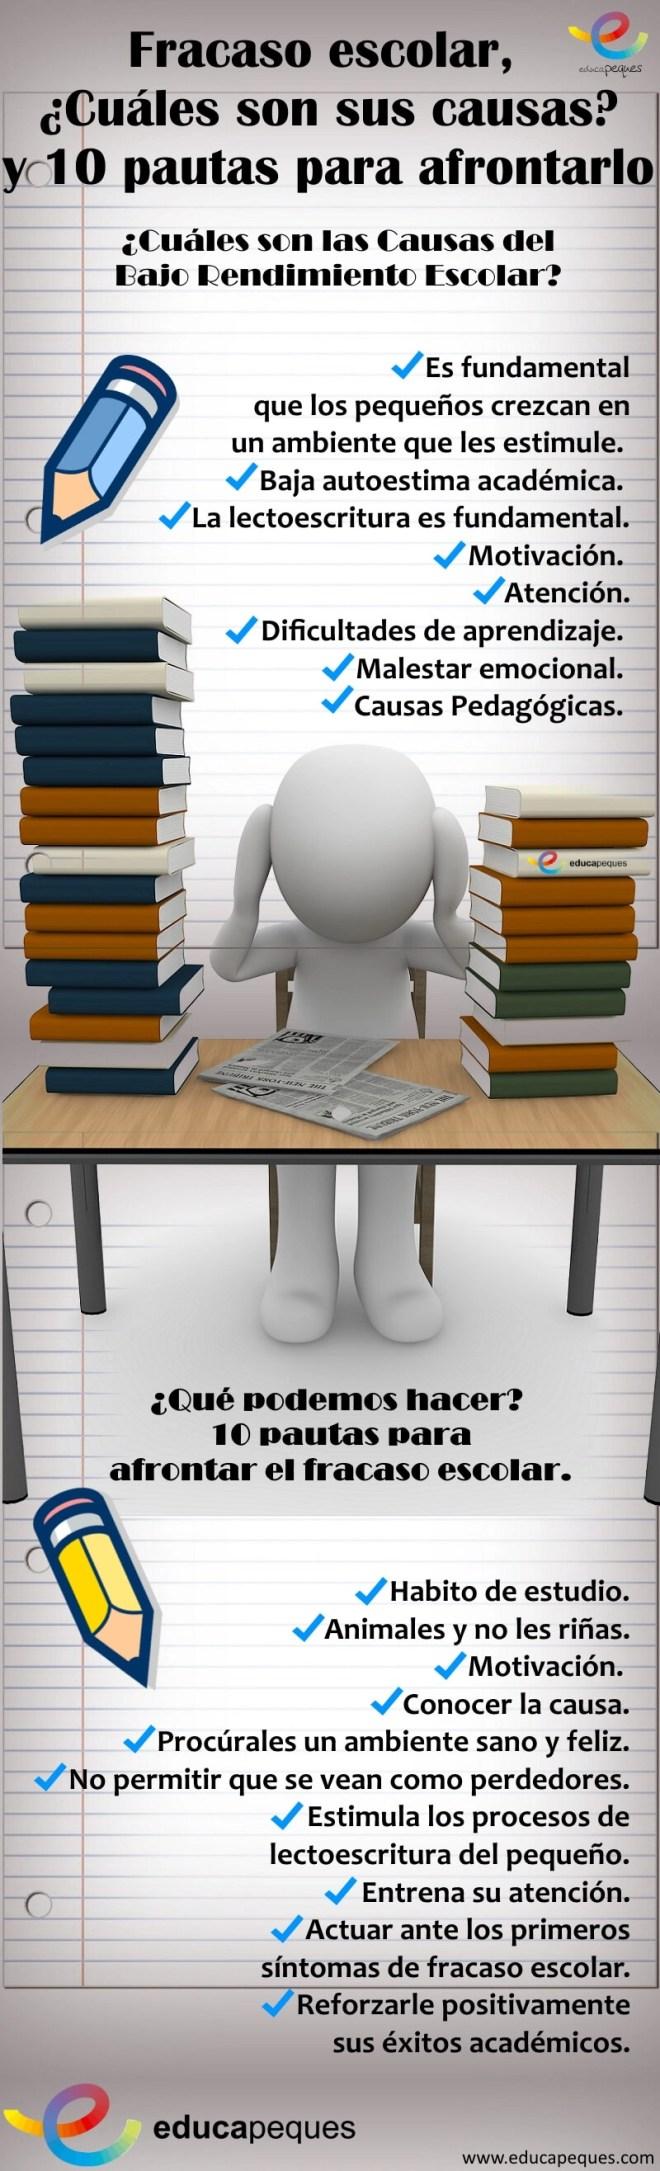 Infografia el fracaso escolar